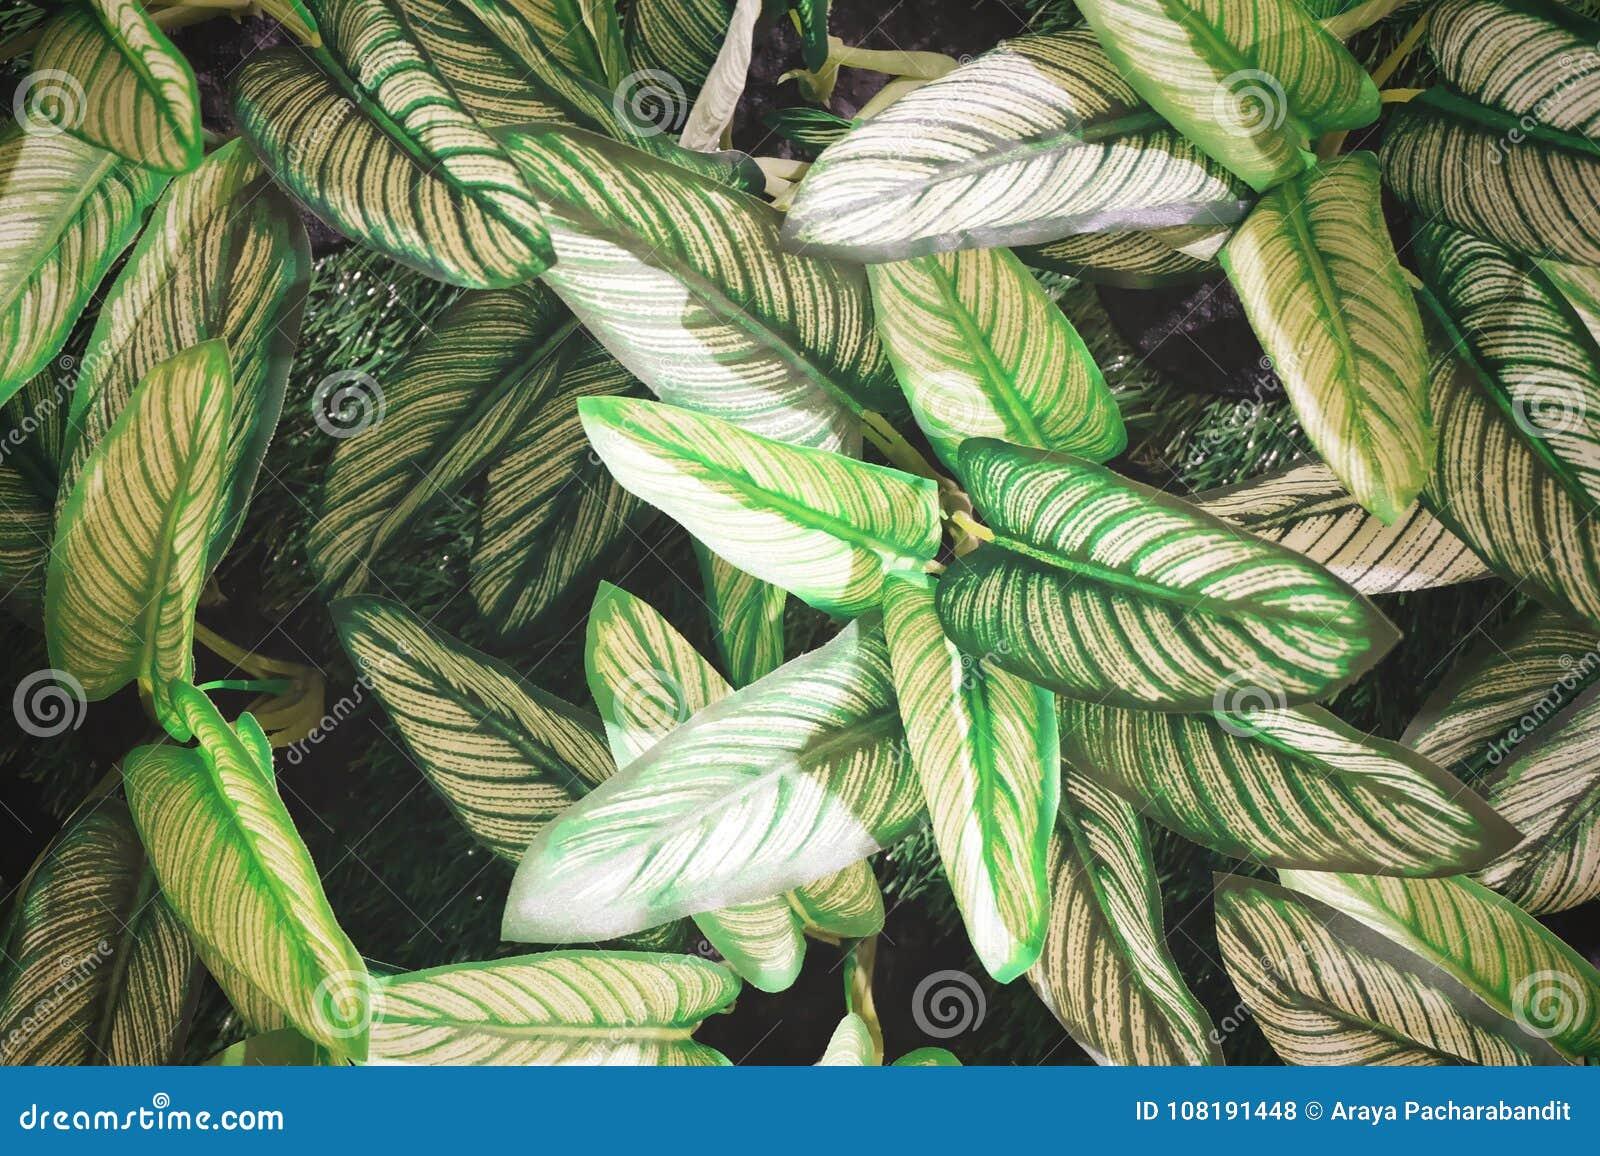 Artificial Dumb Cane Leaves or Dieffenbachia Plants